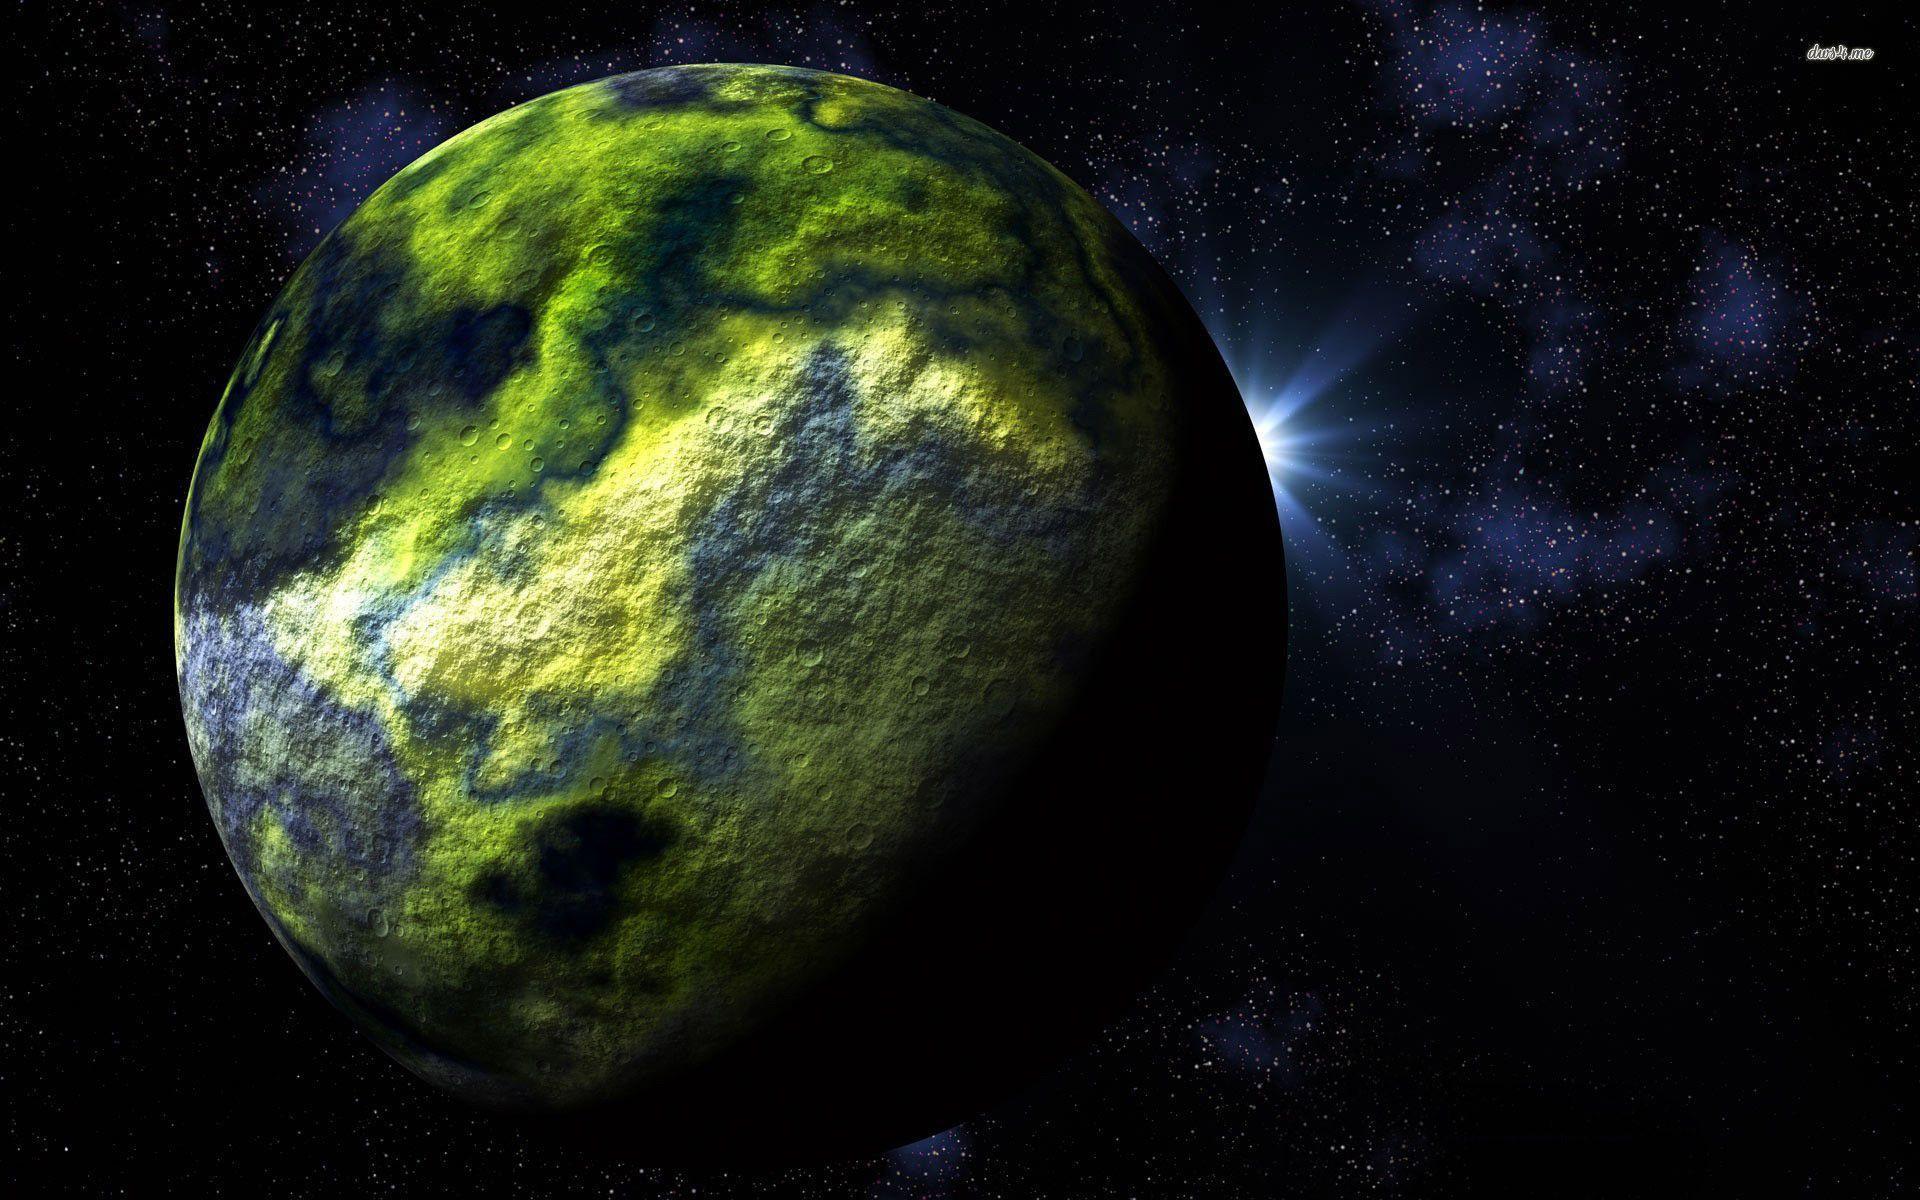 Star Wars Wallpaper Hd 1080p Green Planet Wallpapers Wallpaper Cave